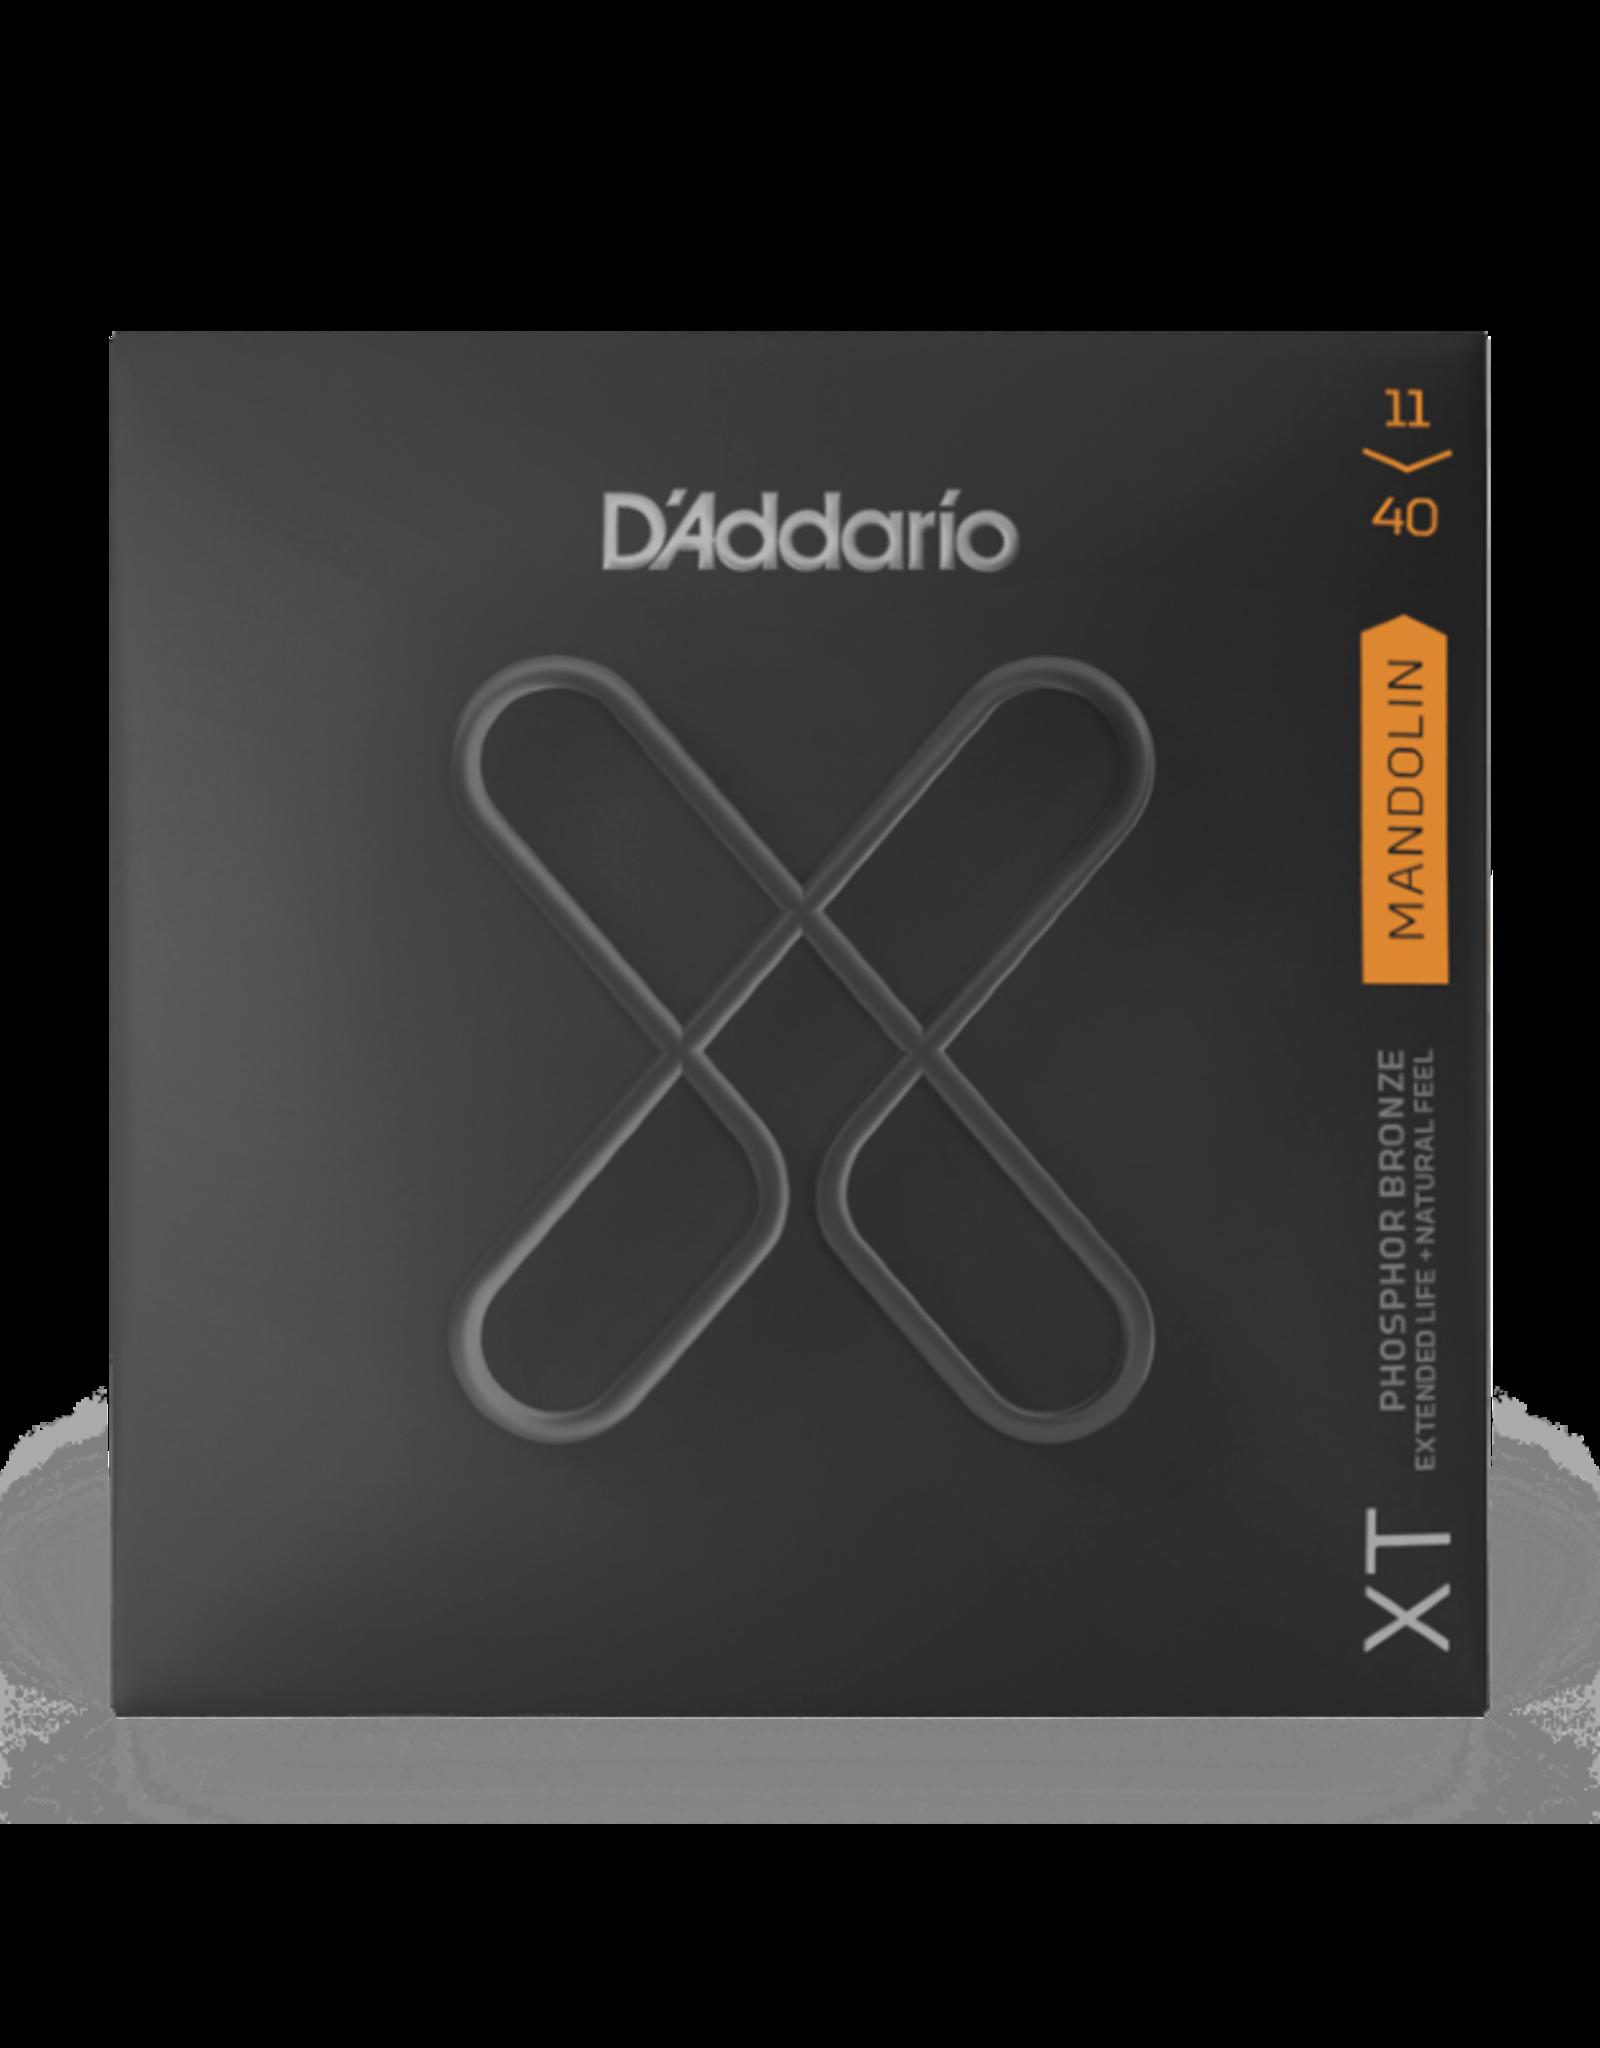 D'Addario D'Addario XT Phosphor Bronze Mandolin Strings Medium 11-40